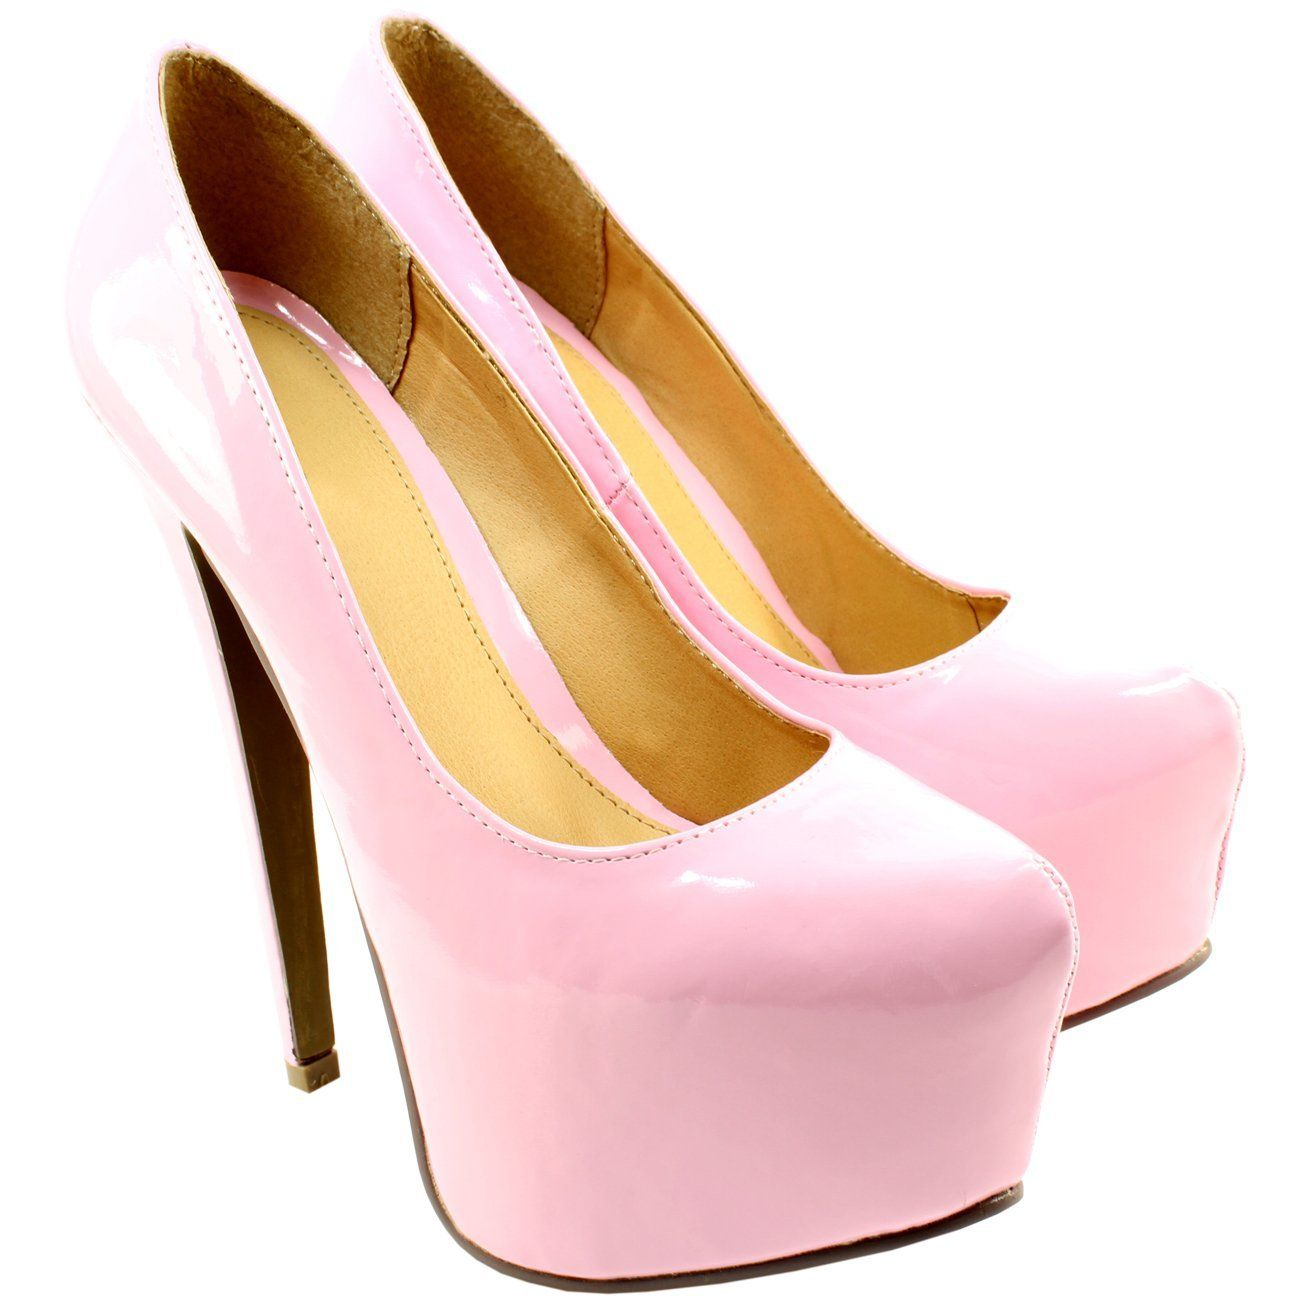 Womens Pastel Stiletto High Platform Heel Shoes